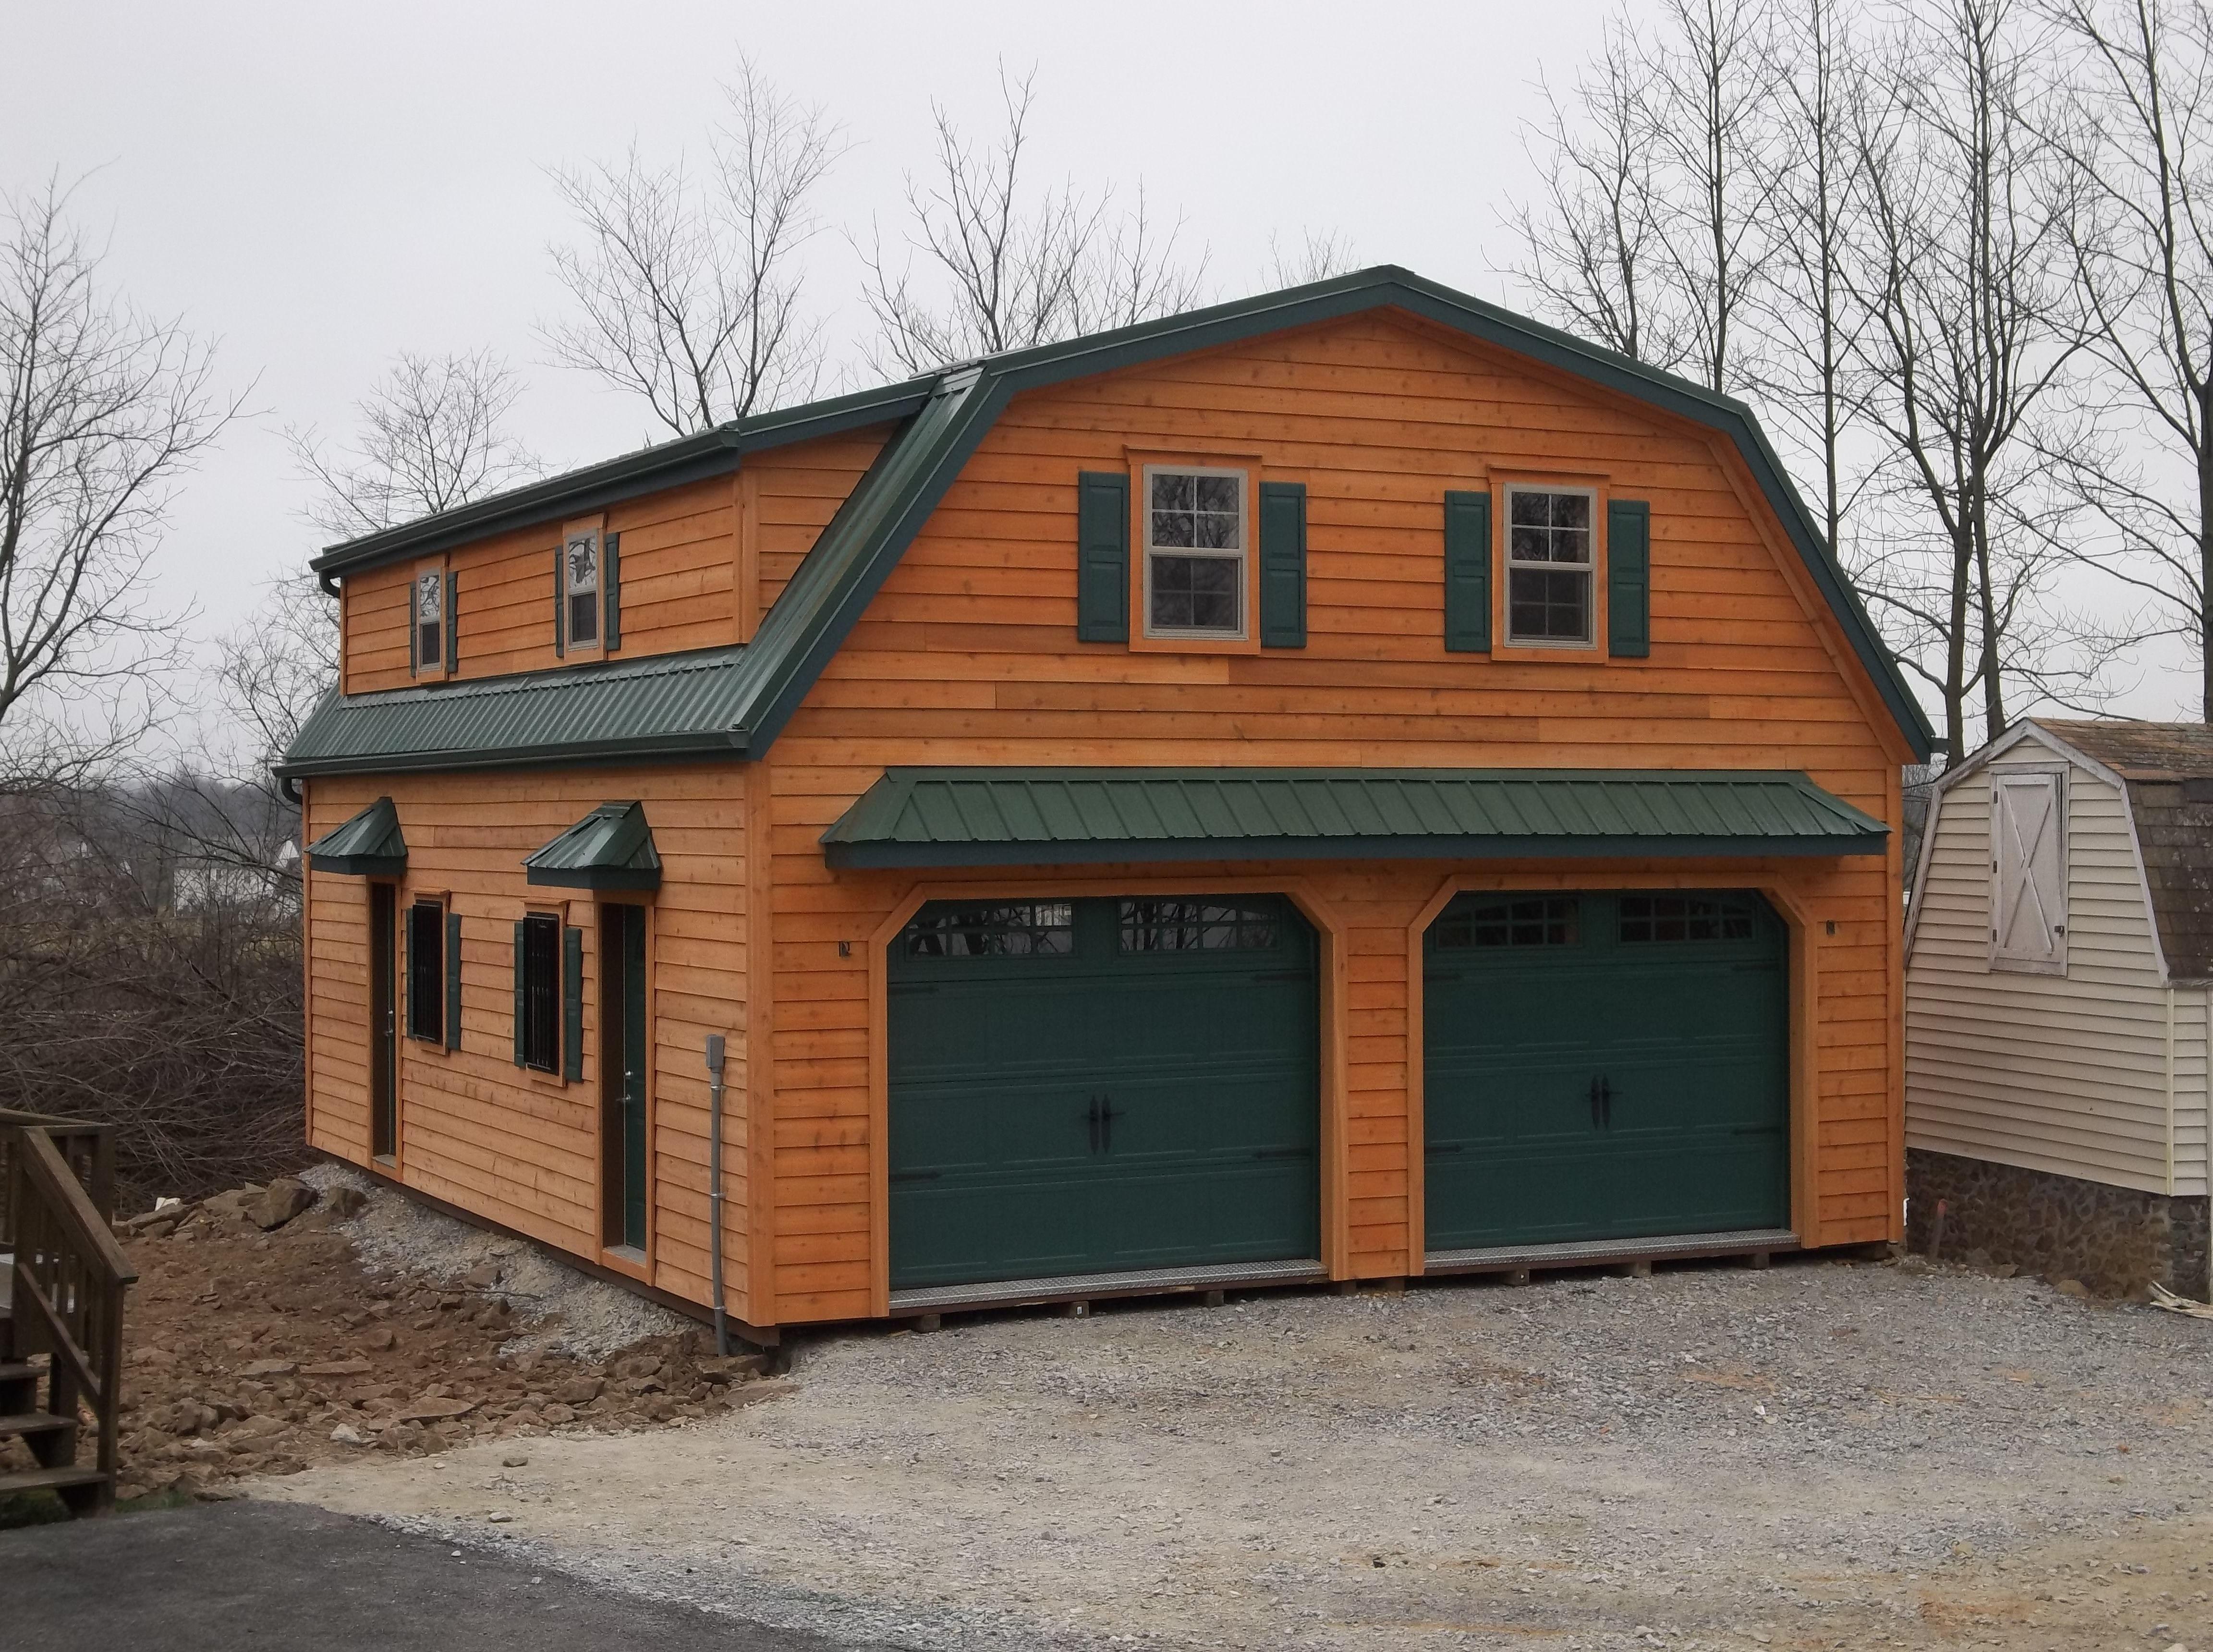 Gambrel 2 Story Garage Garage Loft Gambrel Roof Loft Plan Garage Loft Barn House Plans Loft Plan